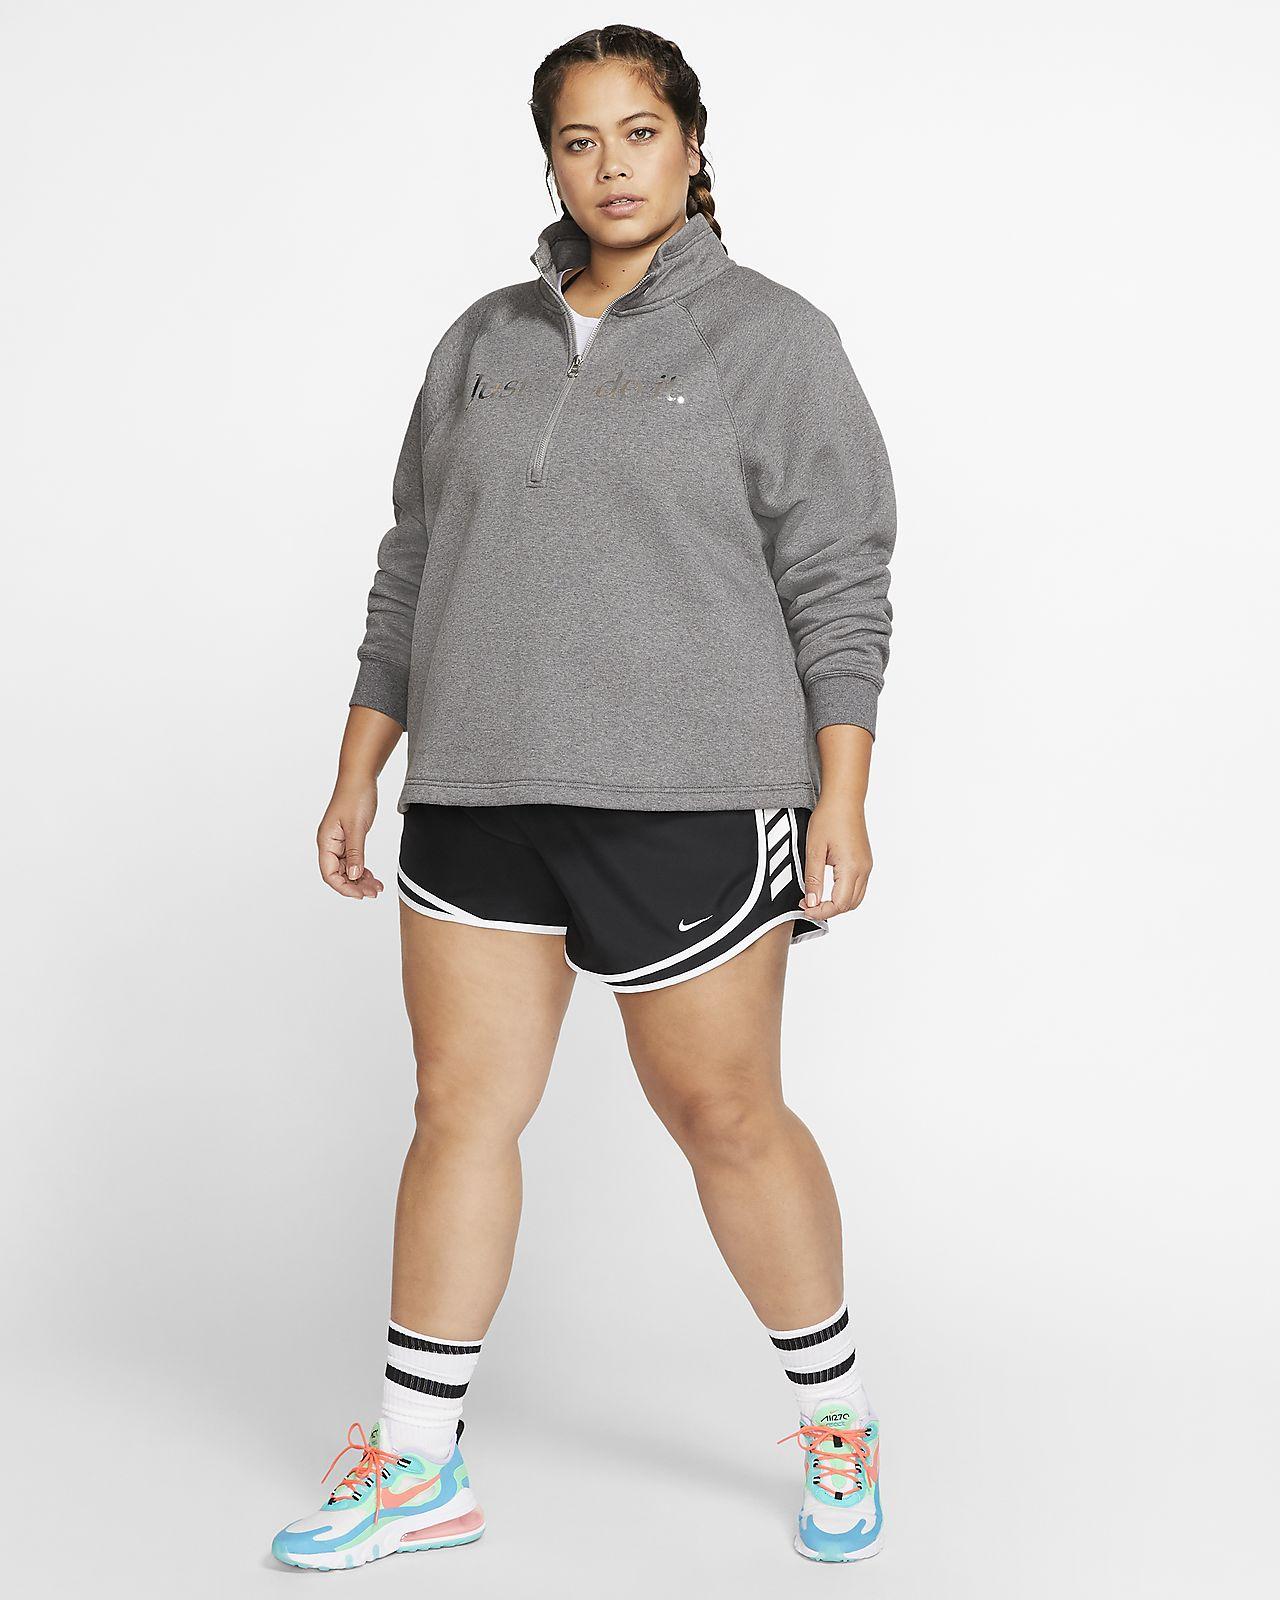 nike fleece 1/4 zip womens